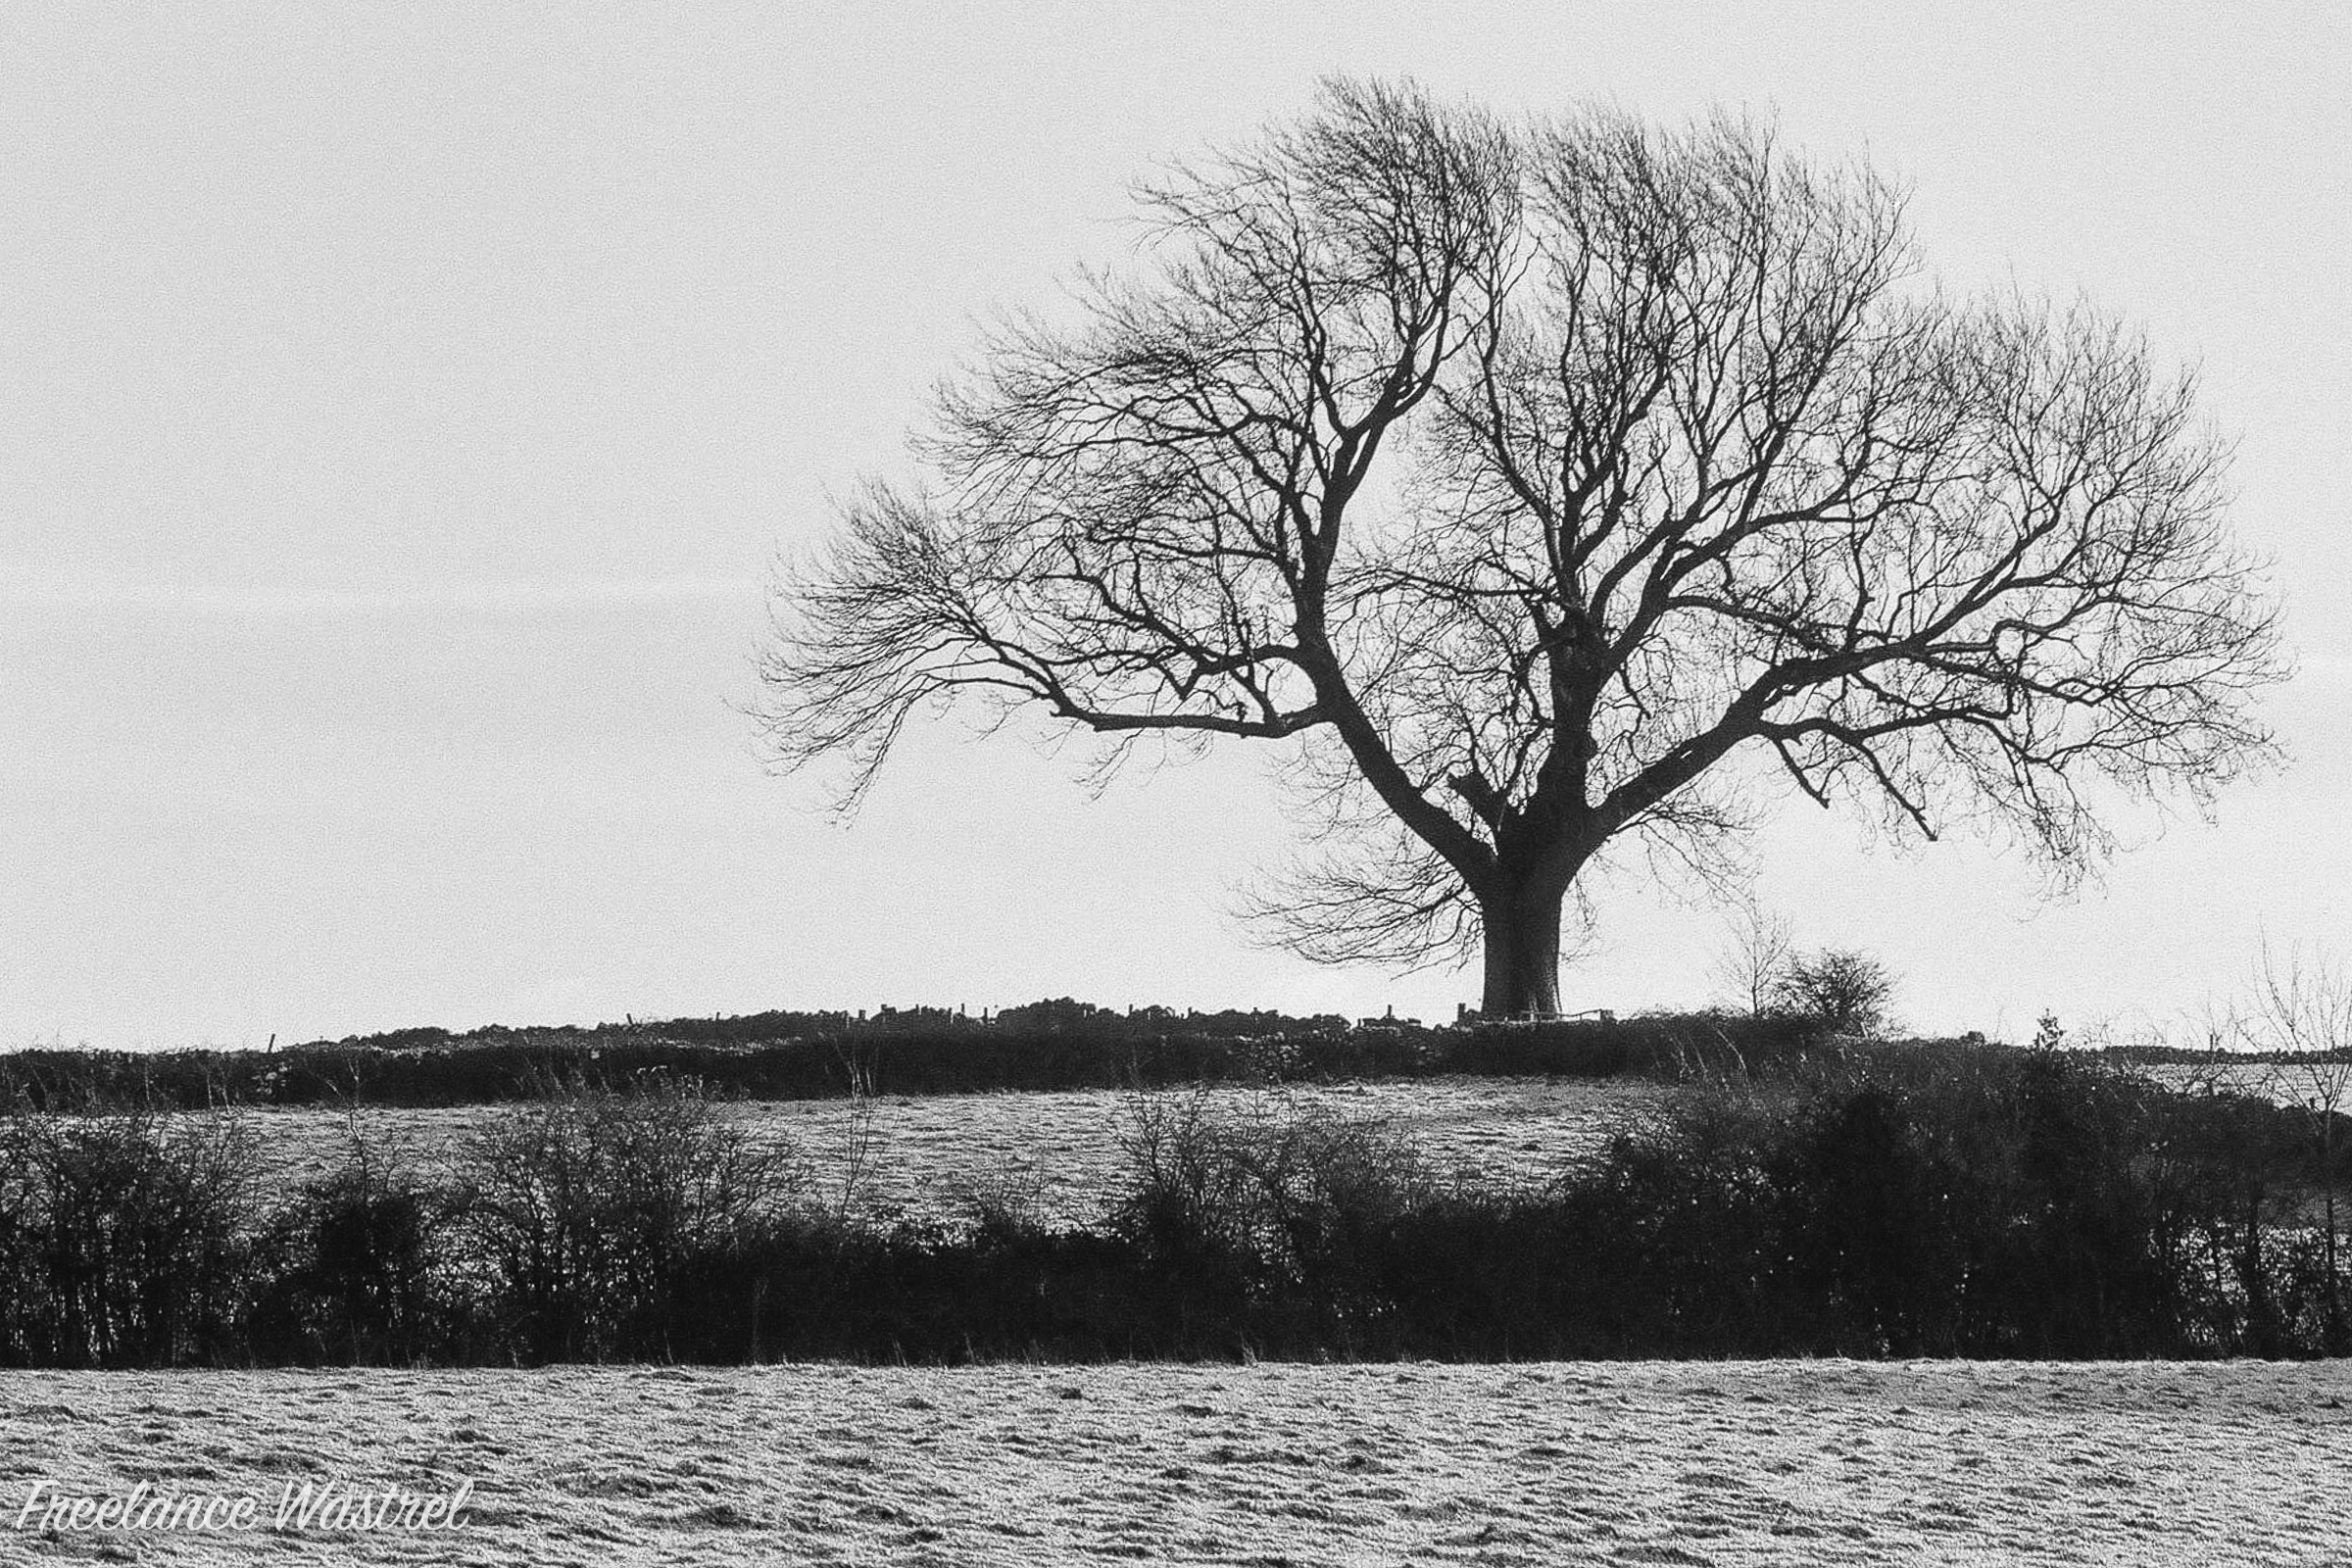 Lone tree, December 2017